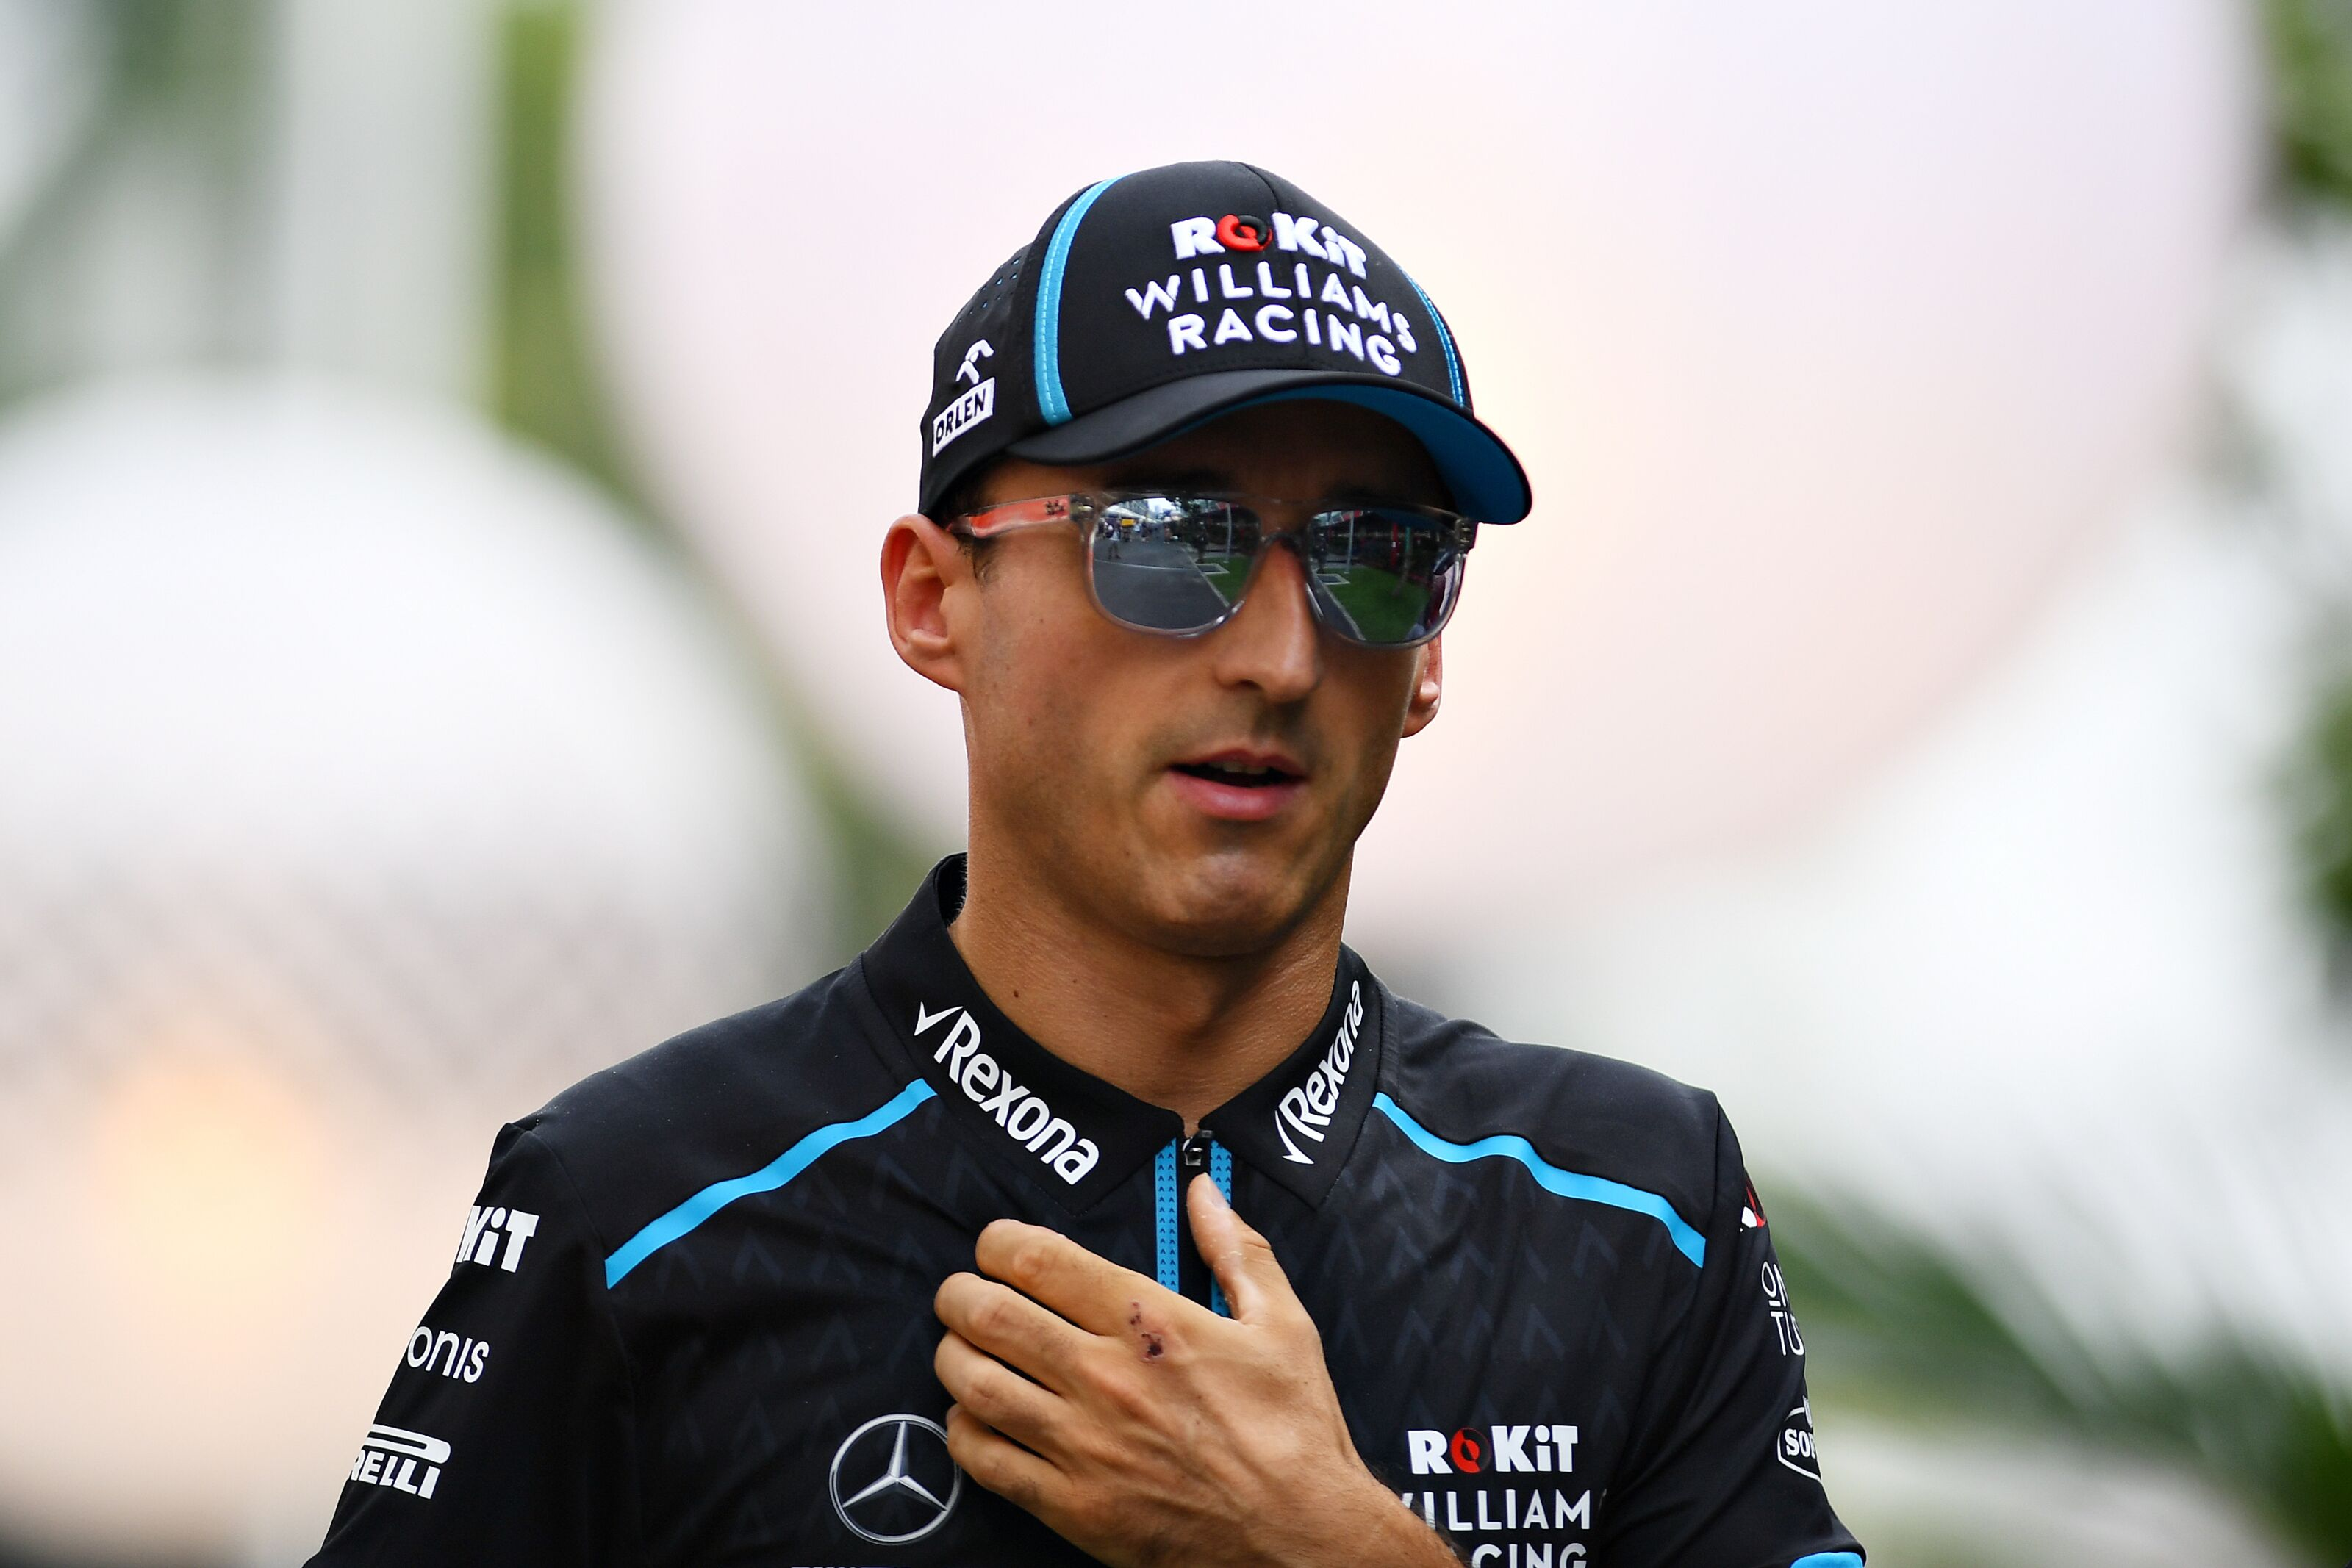 Formula 1: Robert Kubica won't return to Williams in 2020